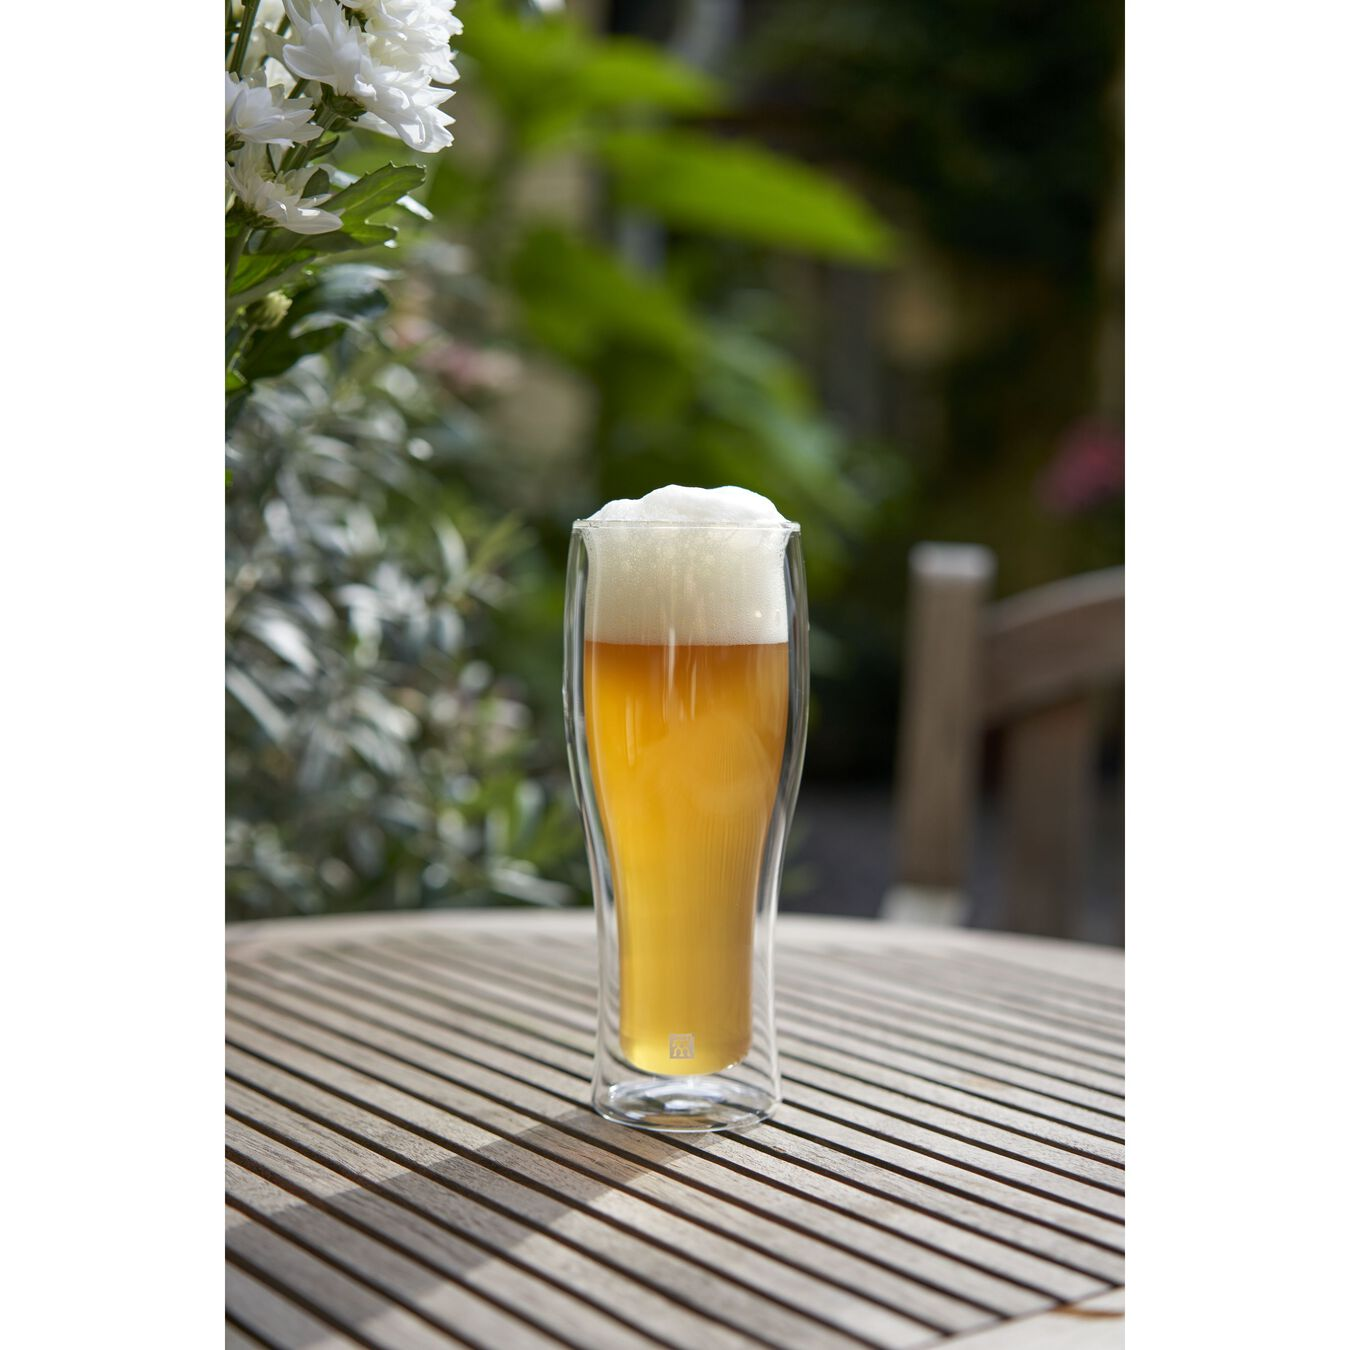 4 Piece Beer glass set,,large 6